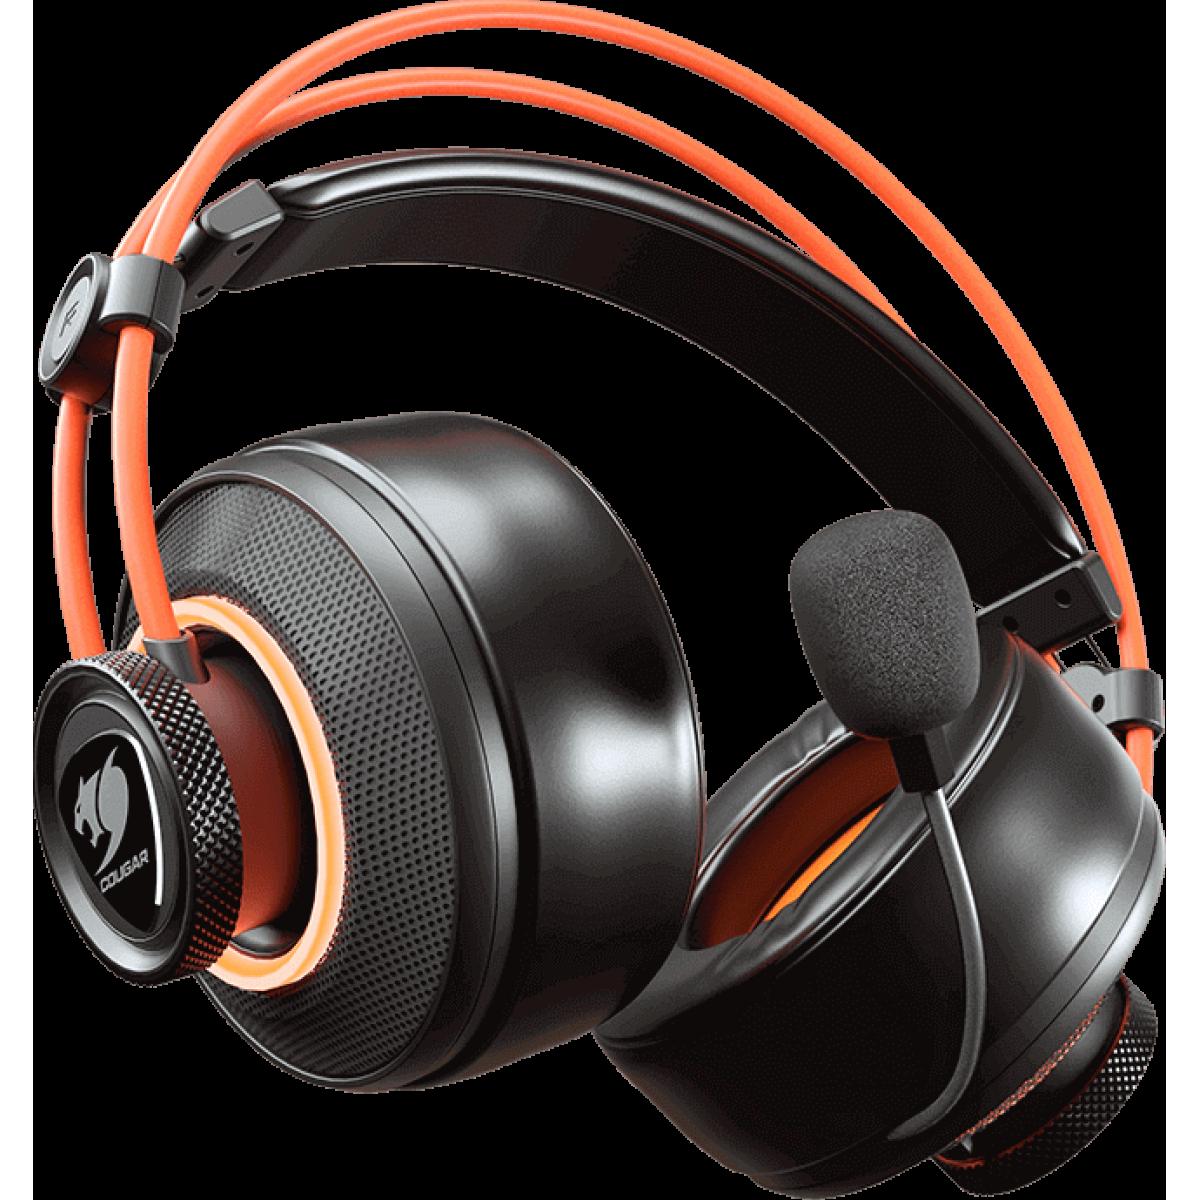 Headset Gamer Cougar Immersa Pro Ti, Surround 7.1, Black/Orange, 3H700U50T.0001